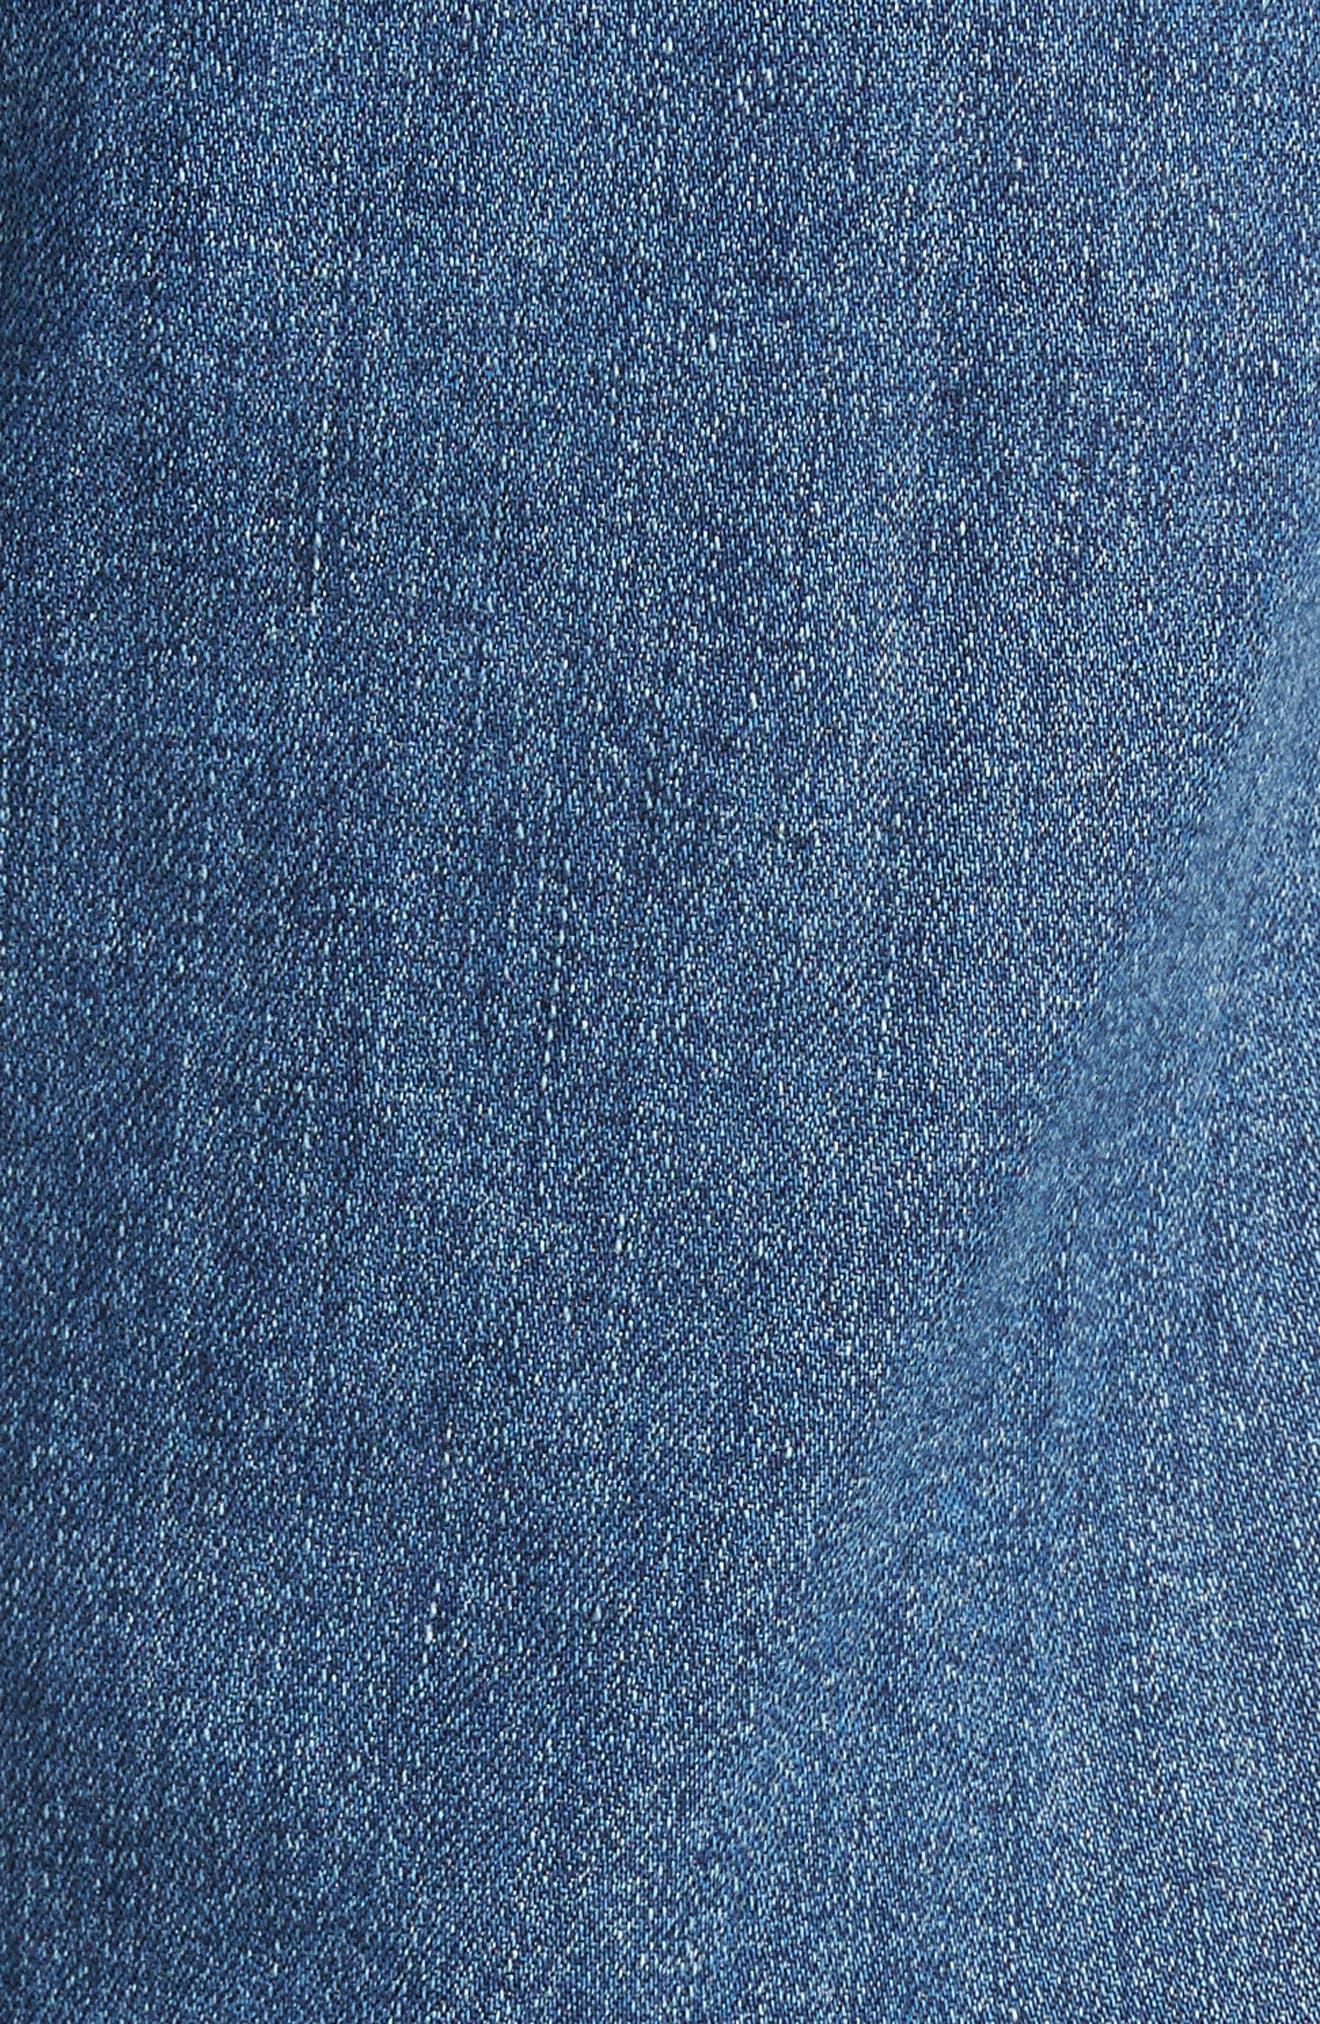 Slimmy Slim Fit Jeans,                             Alternate thumbnail 5, color,                             405